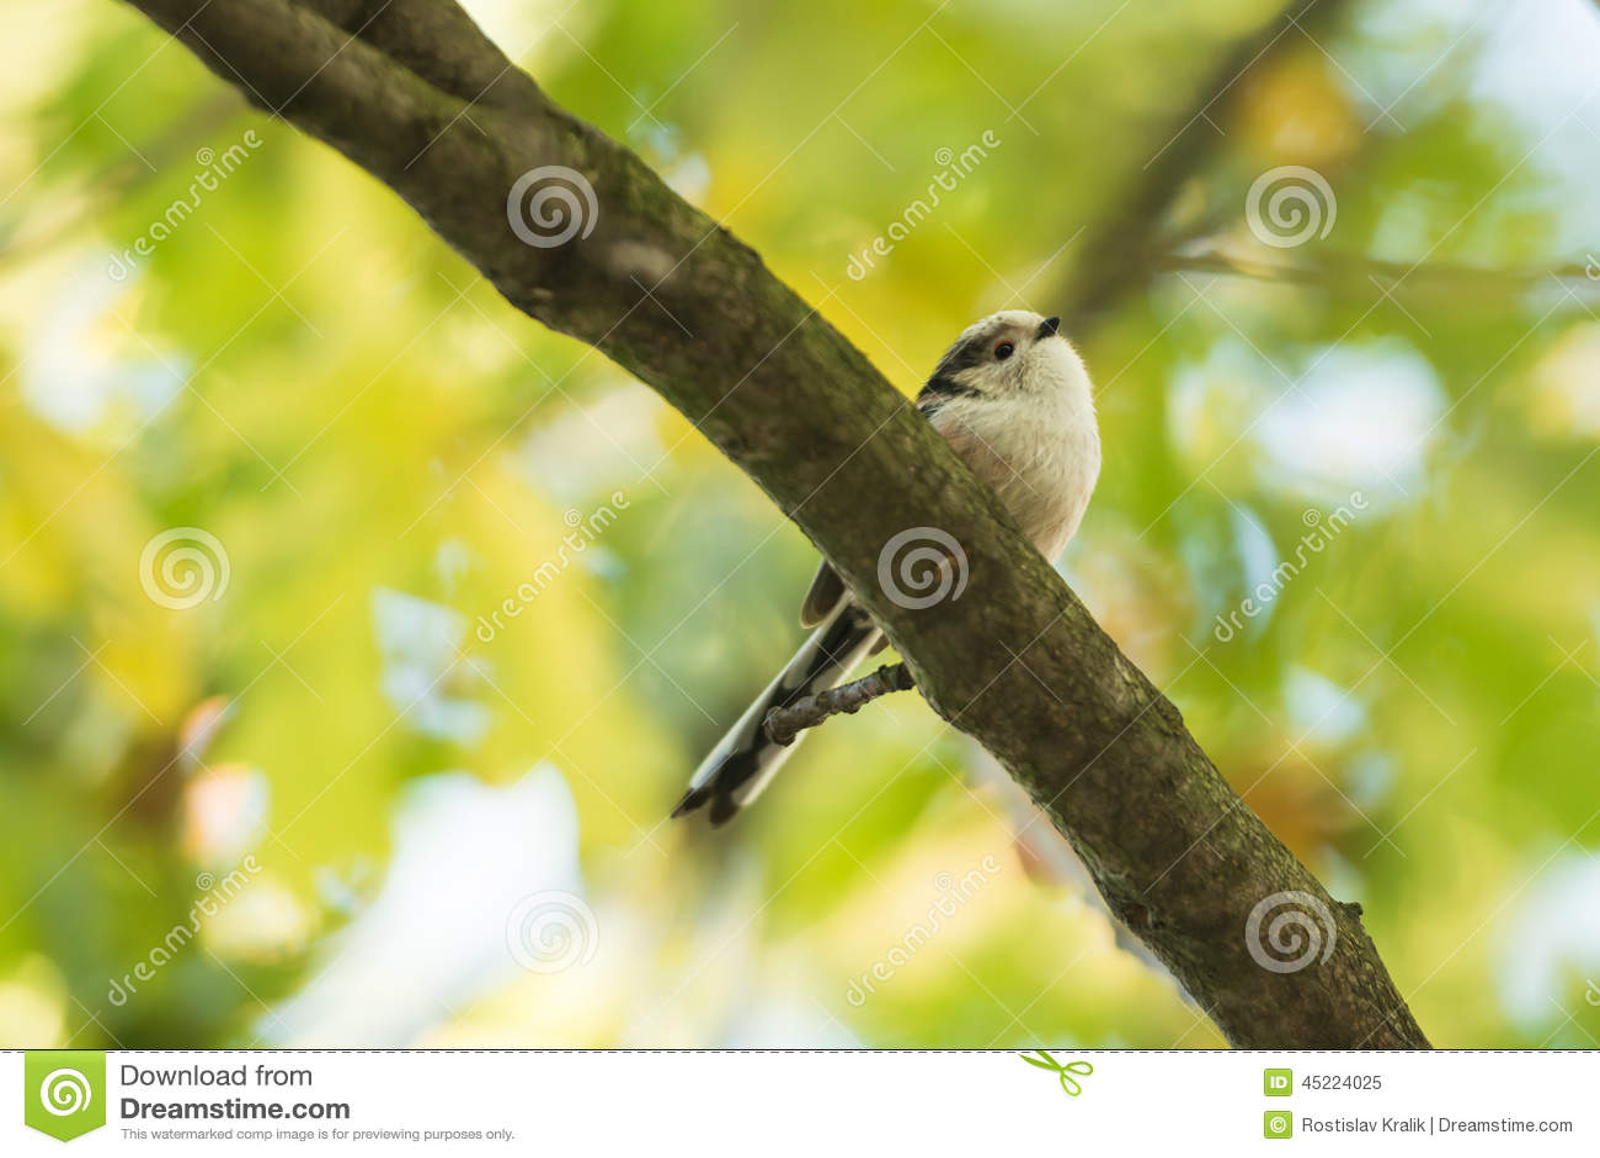 Mooie vogel op de tak